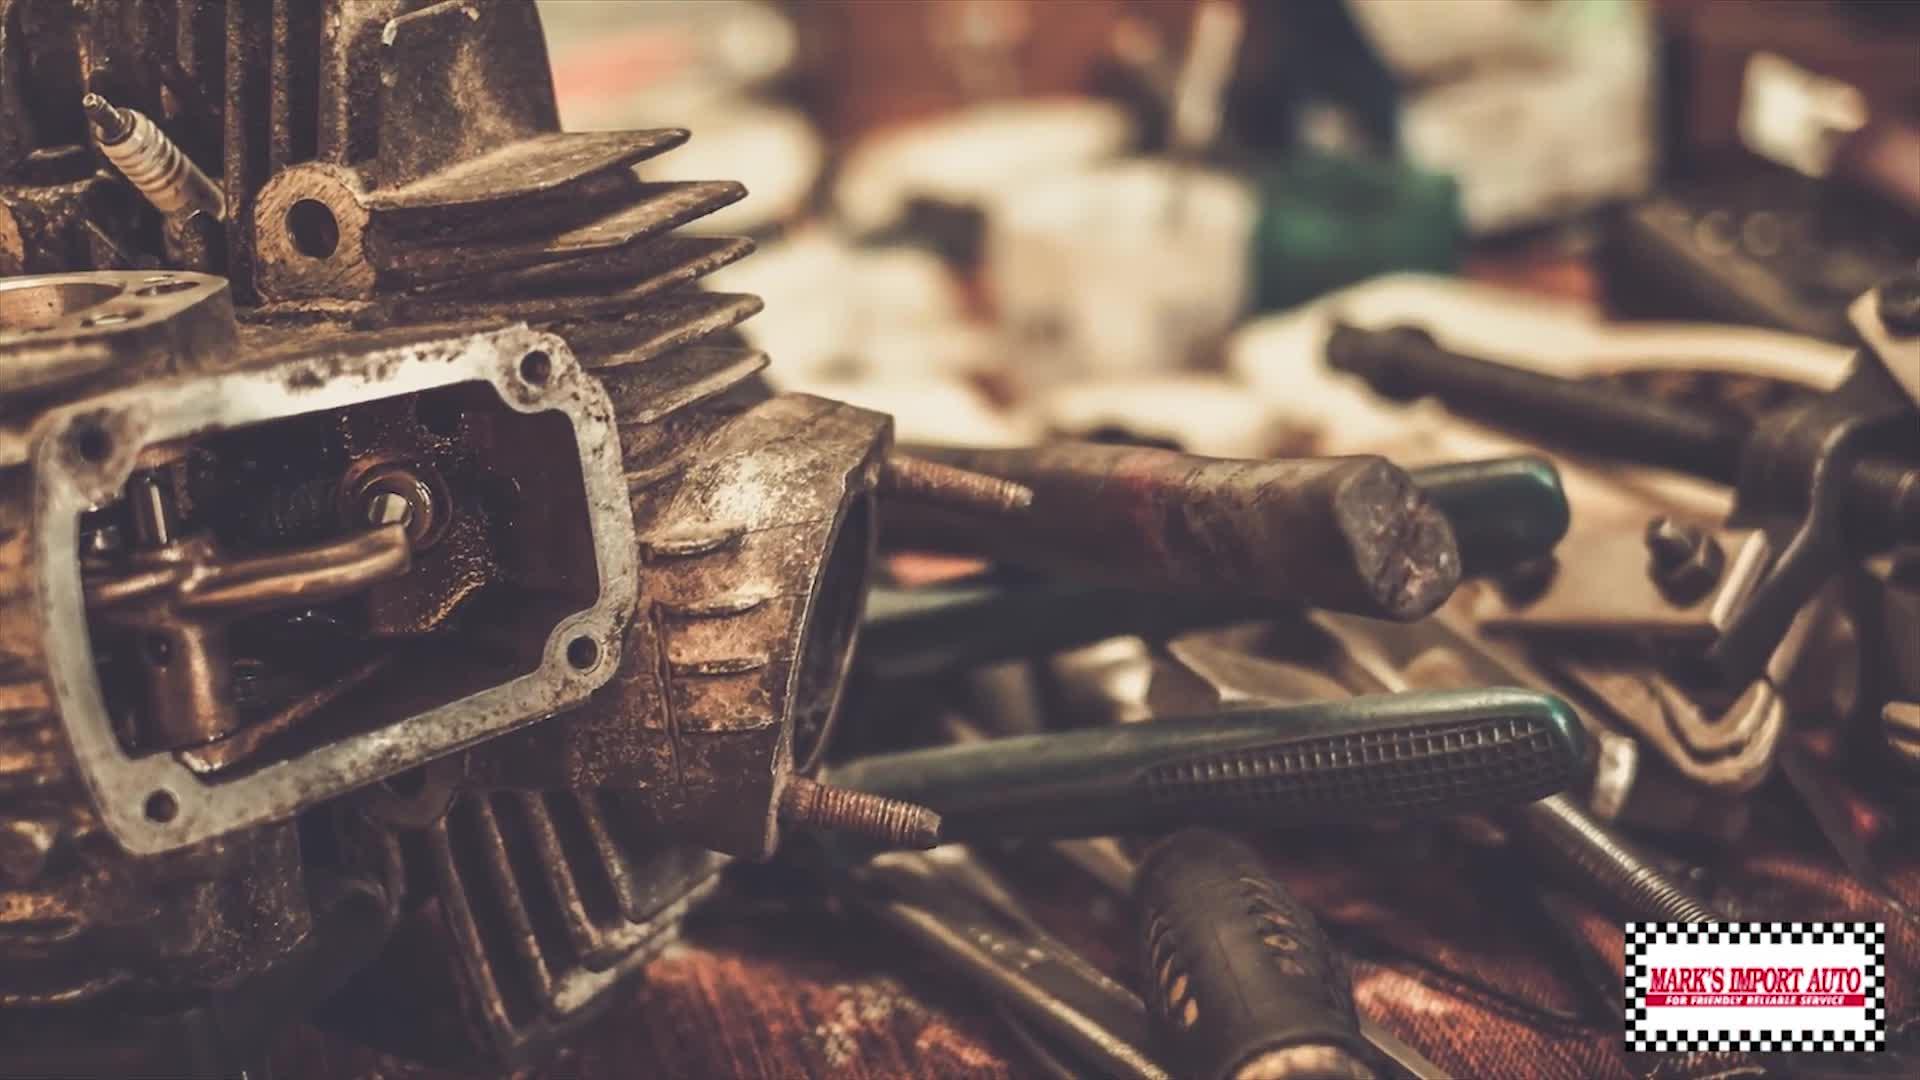 Marks Import Auto - Car Repair & Service - 250-758-7785